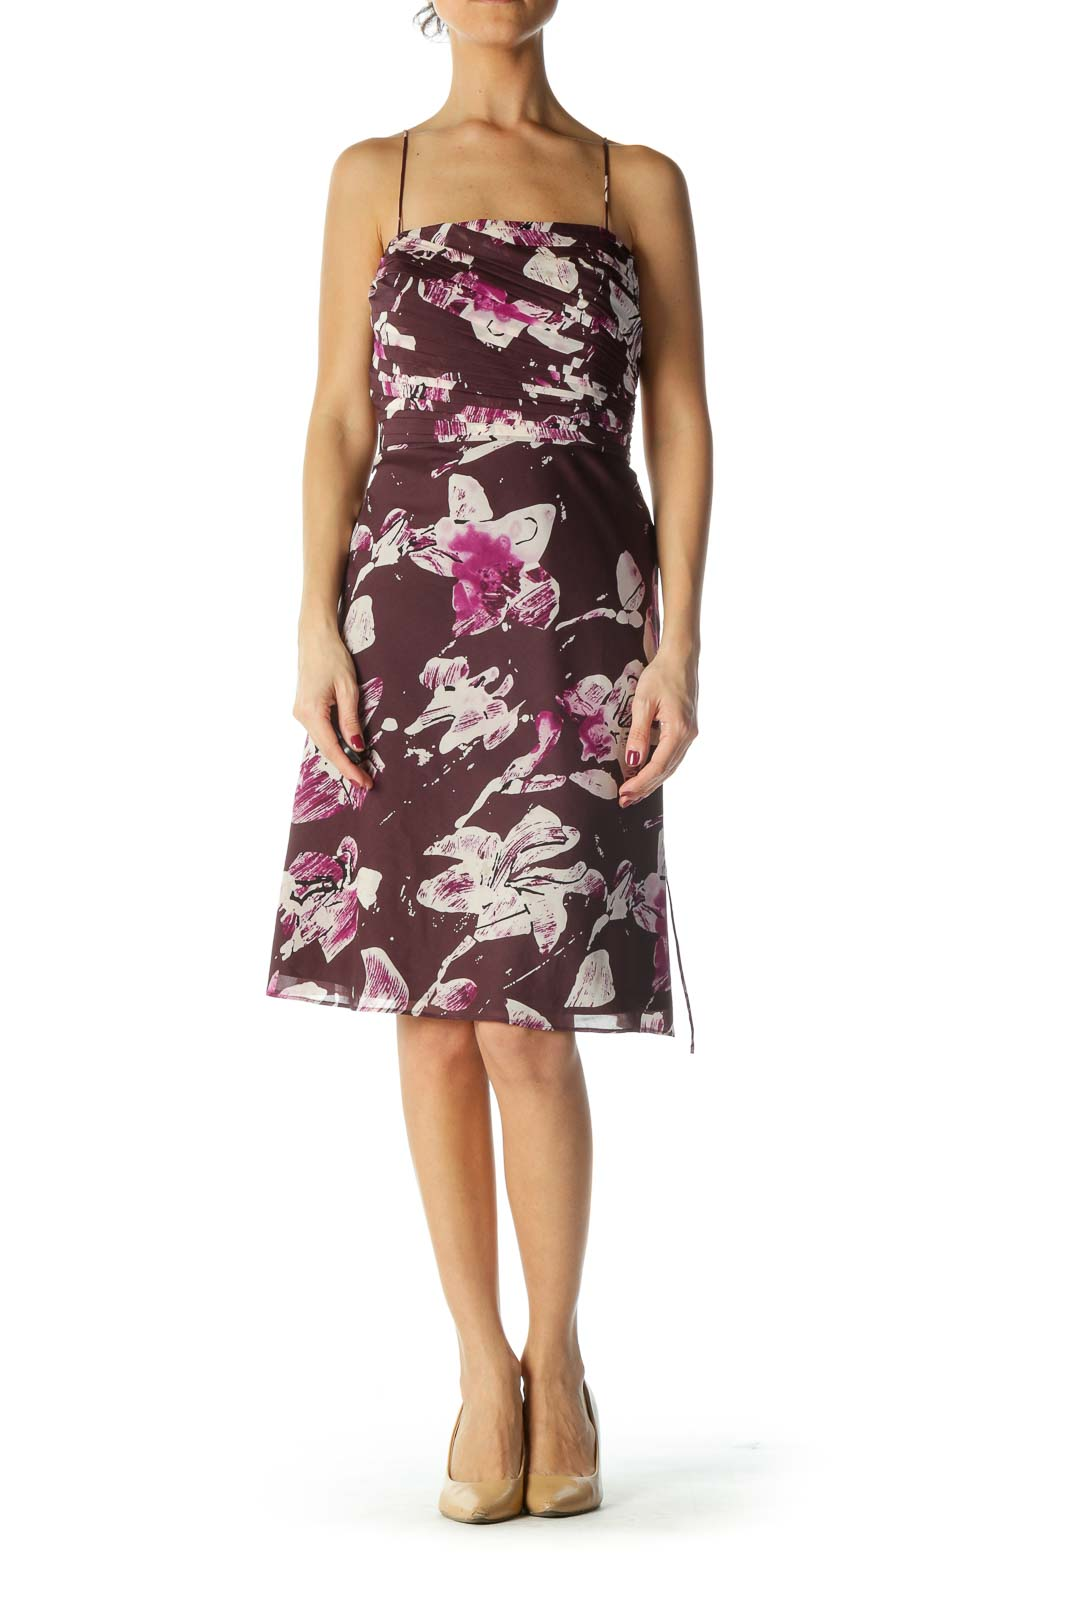 Purple Floral Spaghetti Strap Waist Tie Cocktail Dress